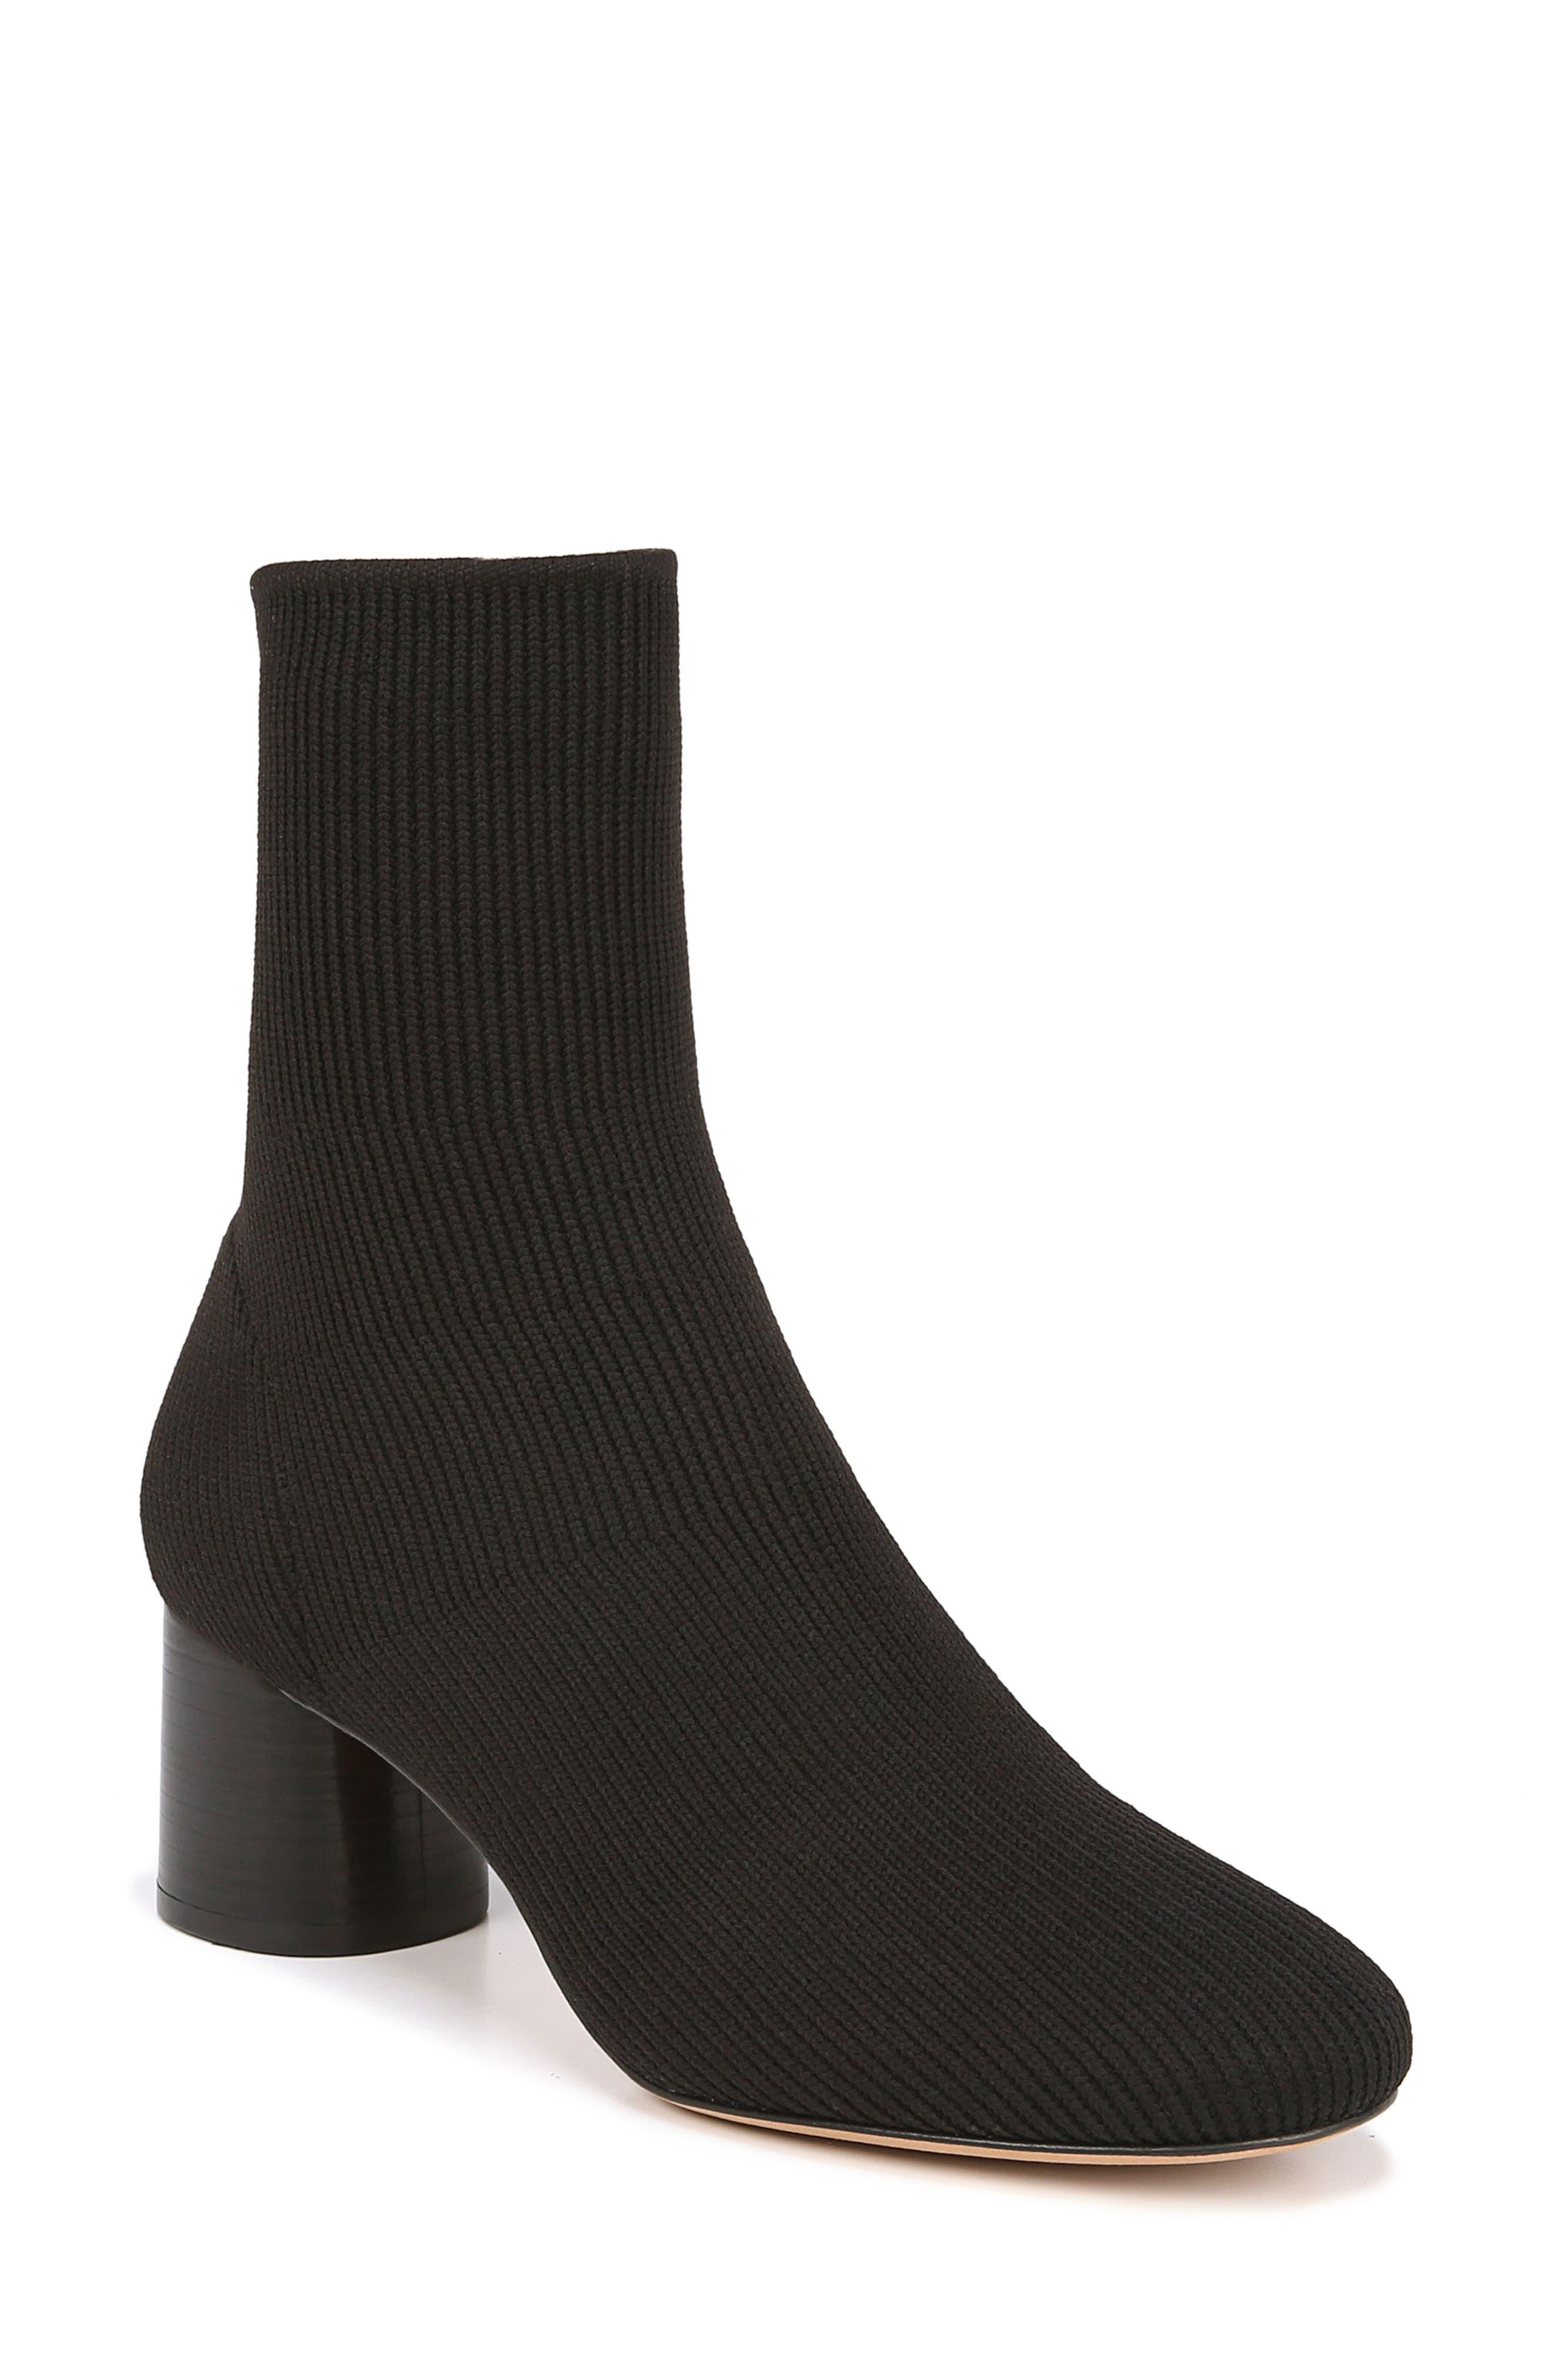 VINCE, Tasha Sock Bootie, Main thumbnail 1, color, BLACK